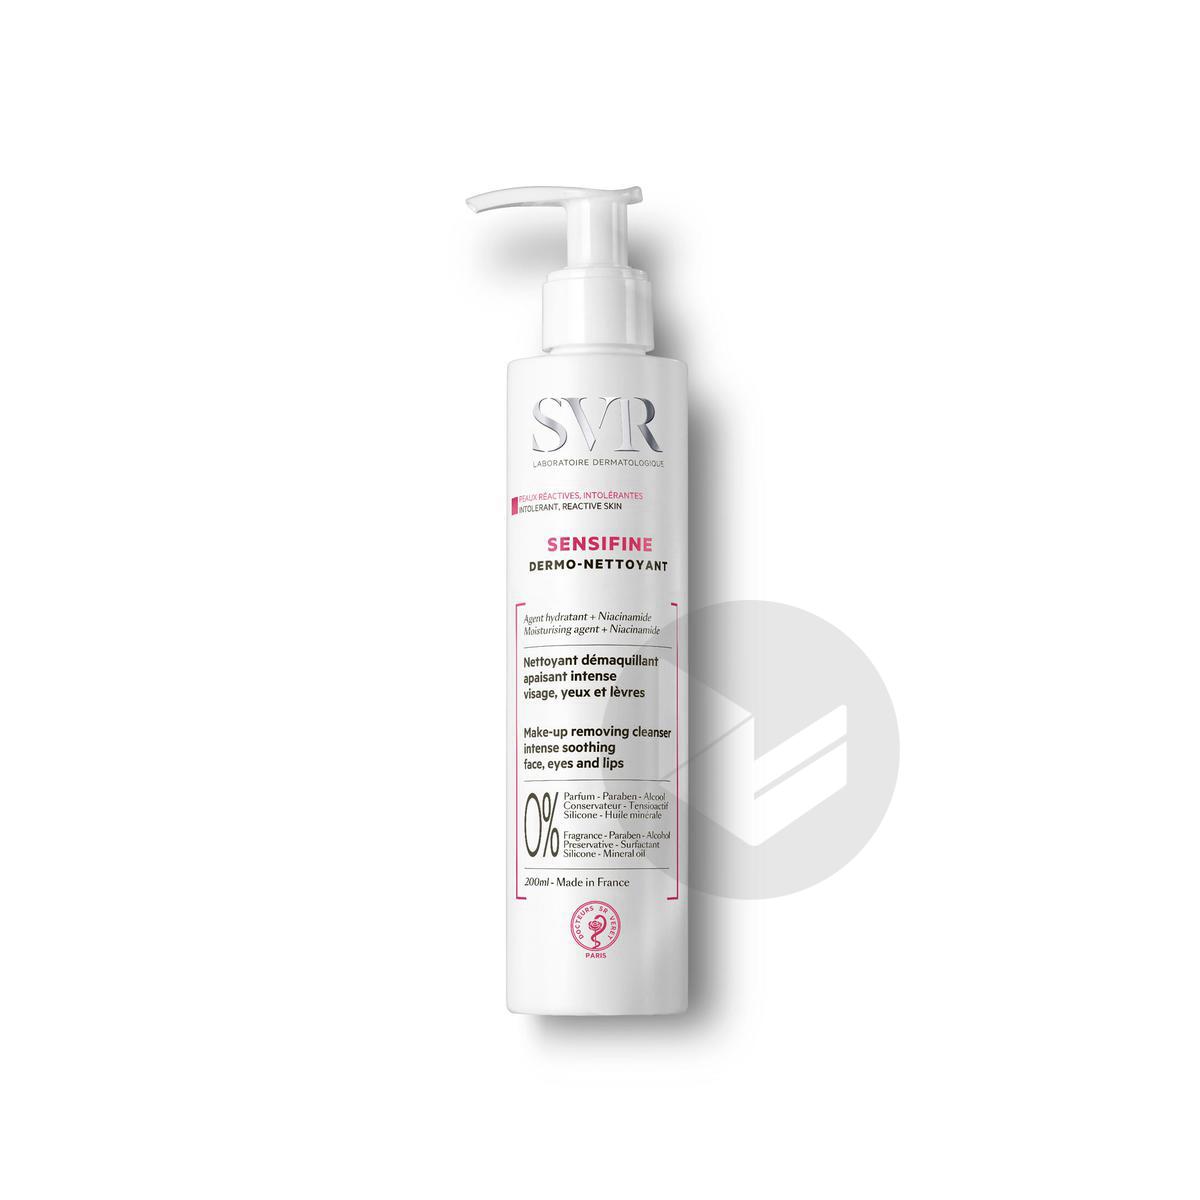 SENSIFINE Dermo-Nettoyant 200 ml